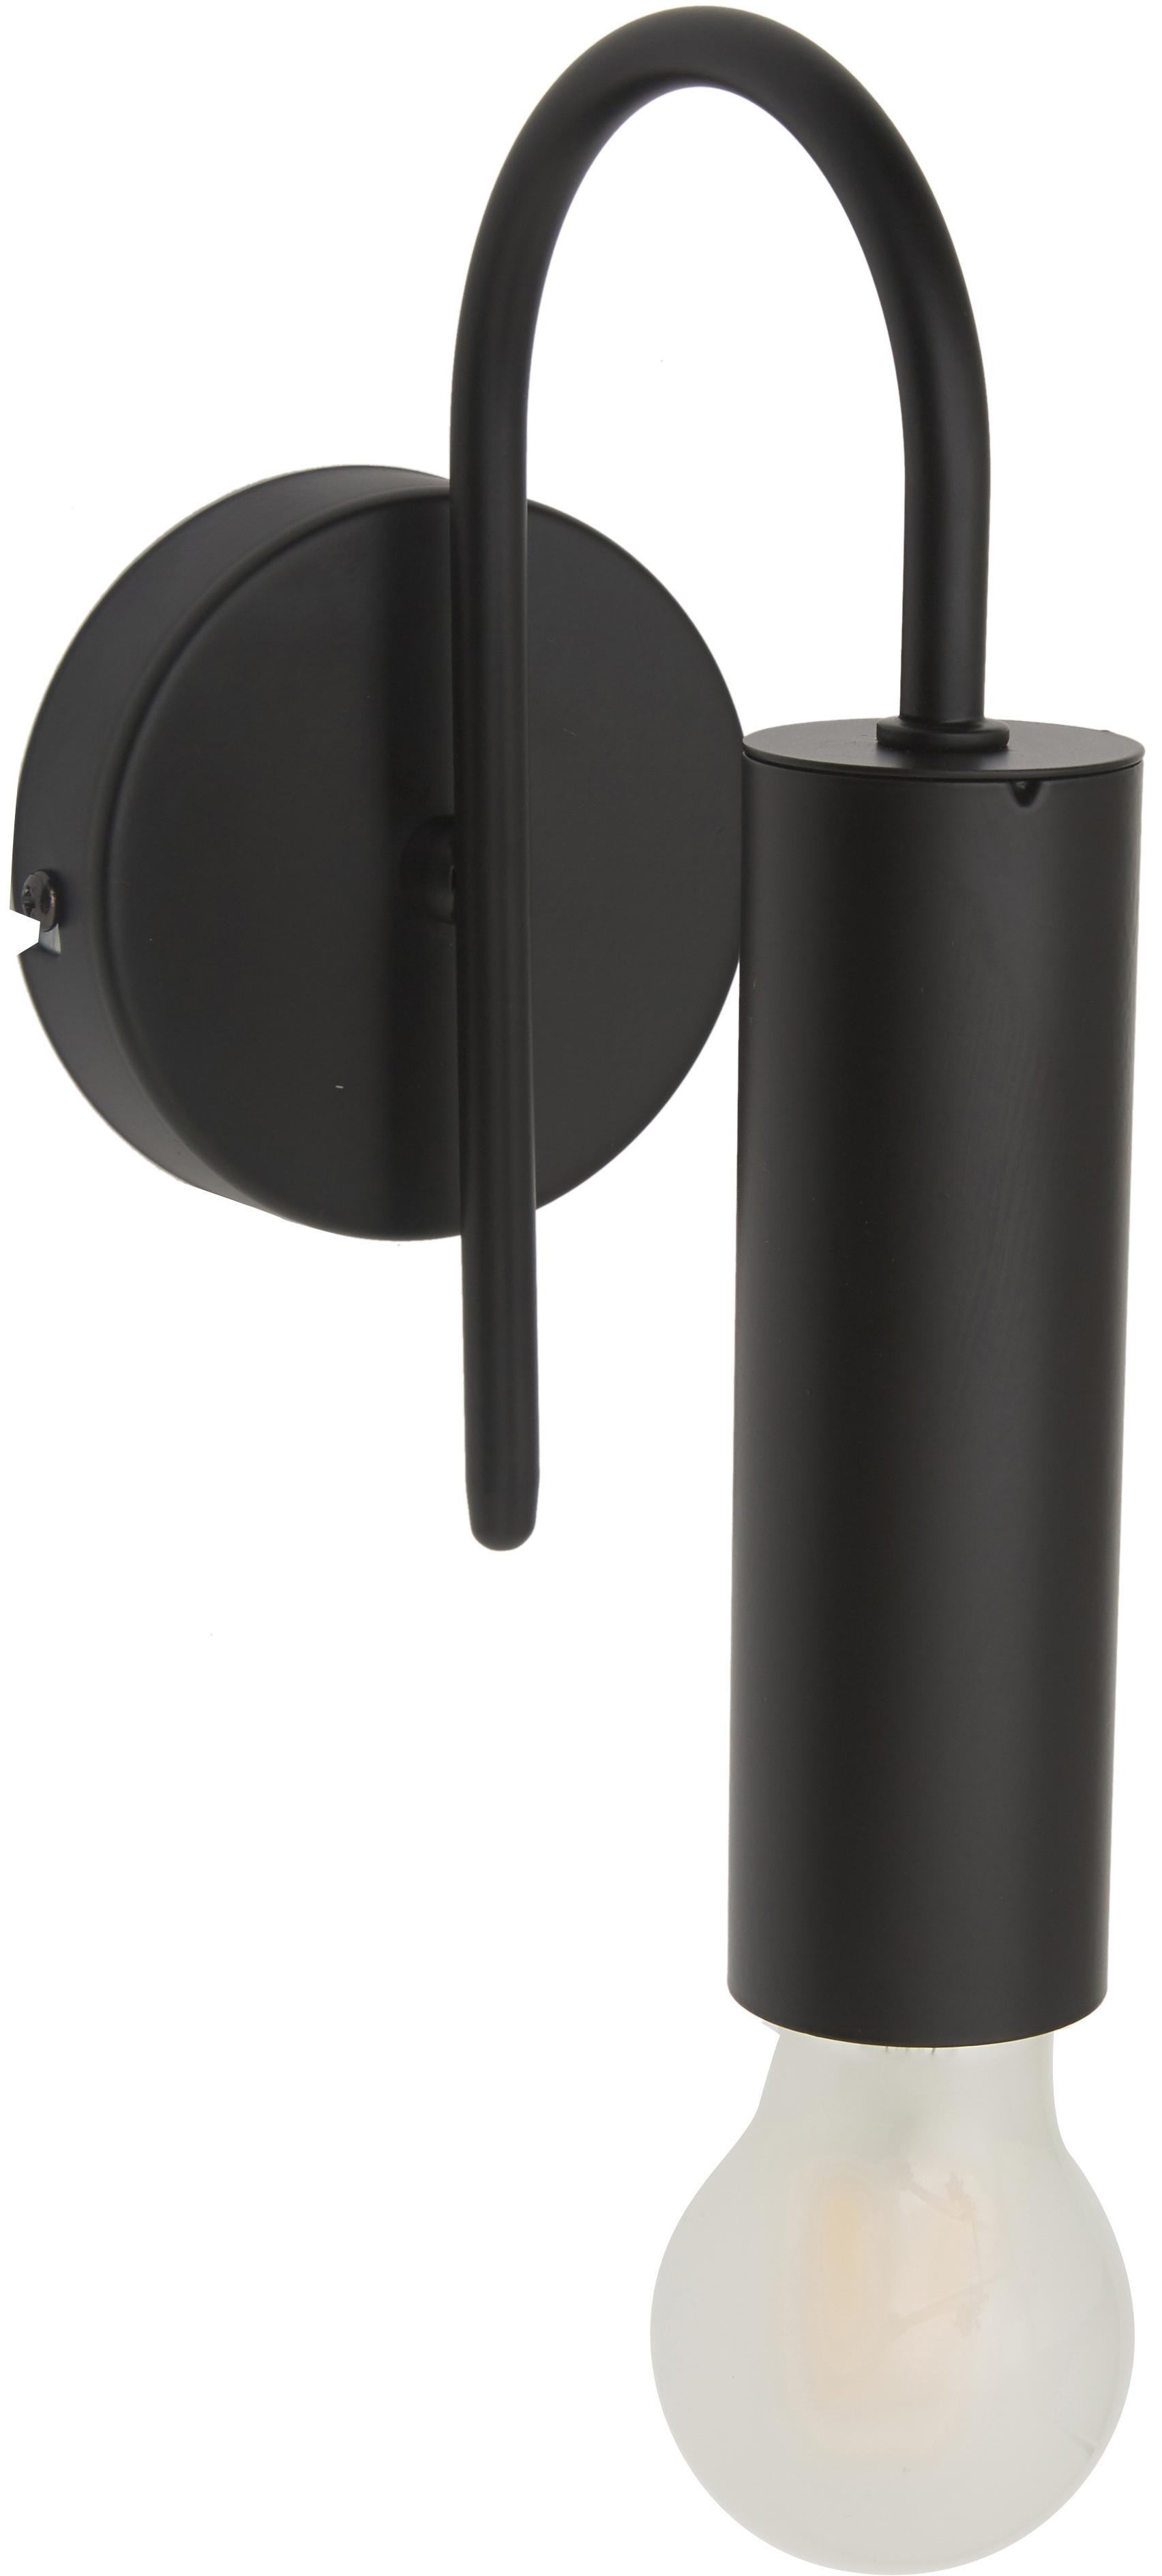 Wandlamp Loppe, Gelakt metaal, Zwart, 10 x 21 cm